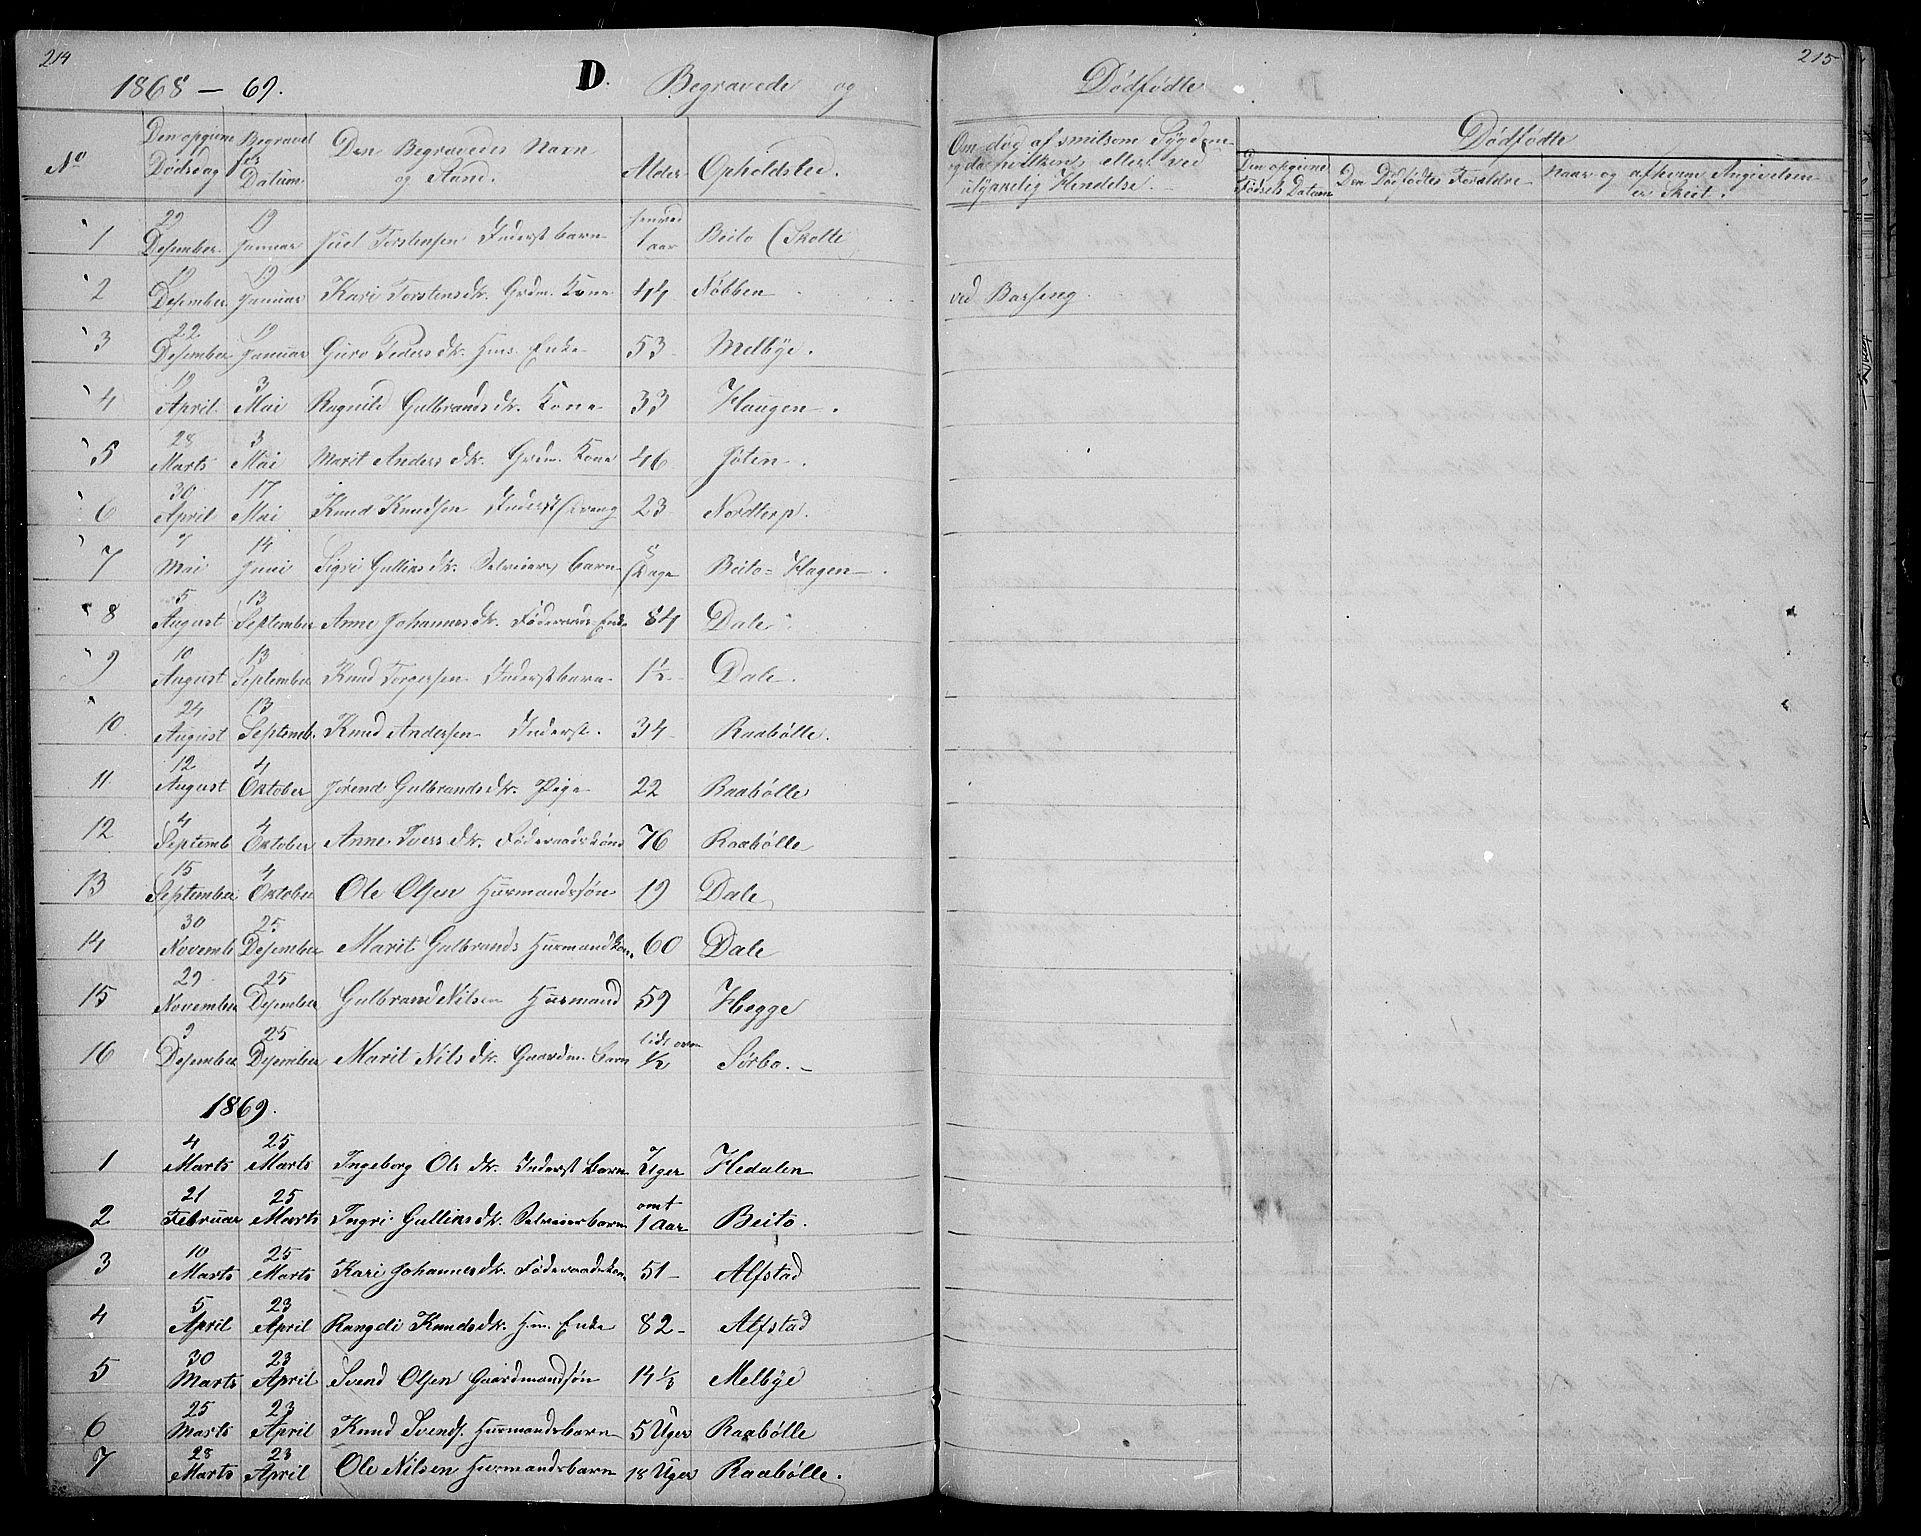 SAH, Øystre Slidre prestekontor, Klokkerbok nr. 1, 1866-1886, s. 214-215